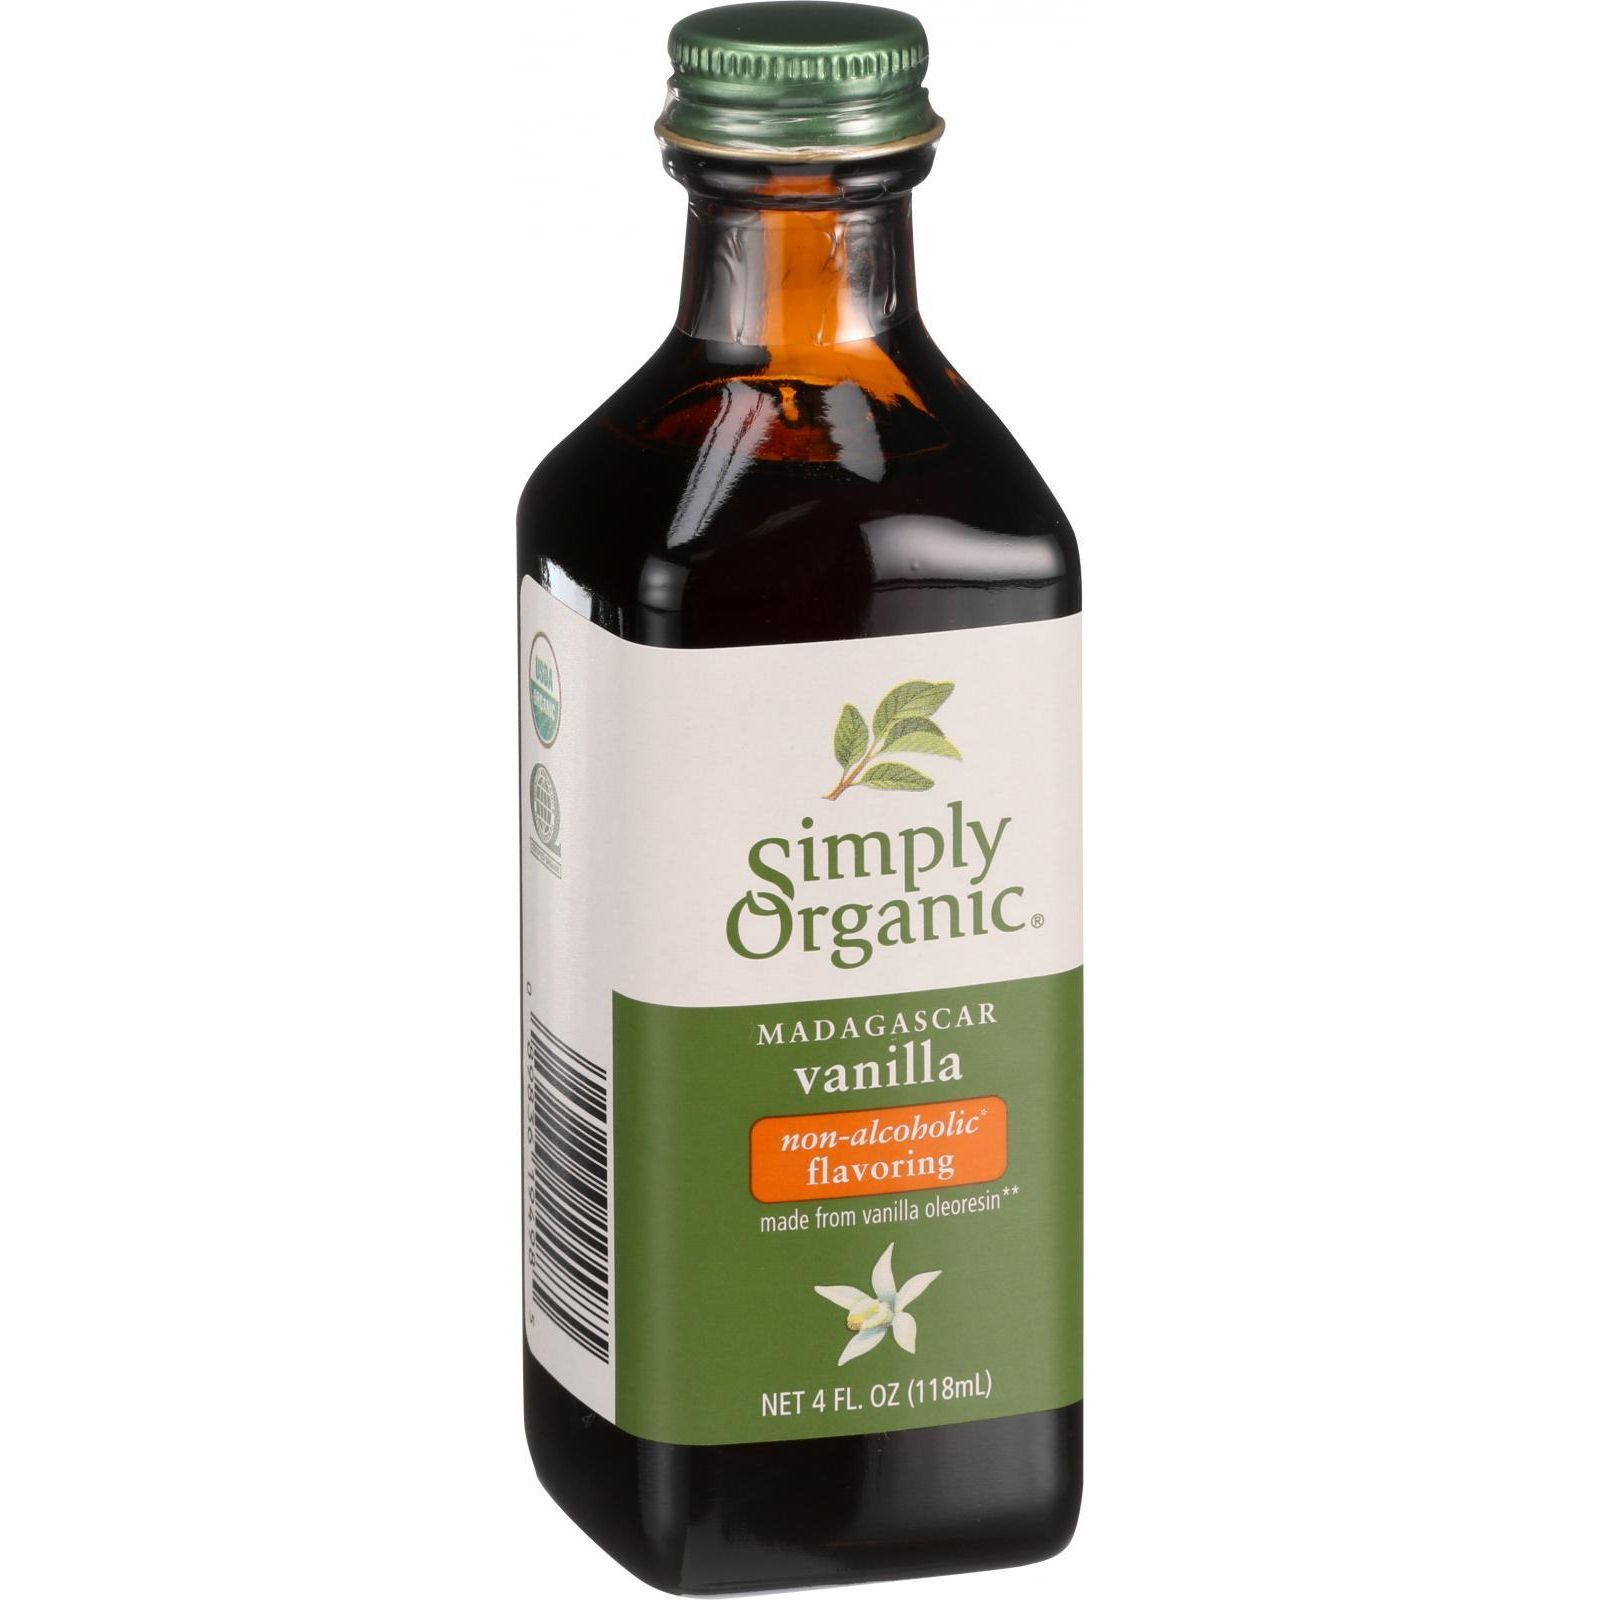 Simply Organic Vanilla Flavoring - Organic - 4 oz - Case of 6